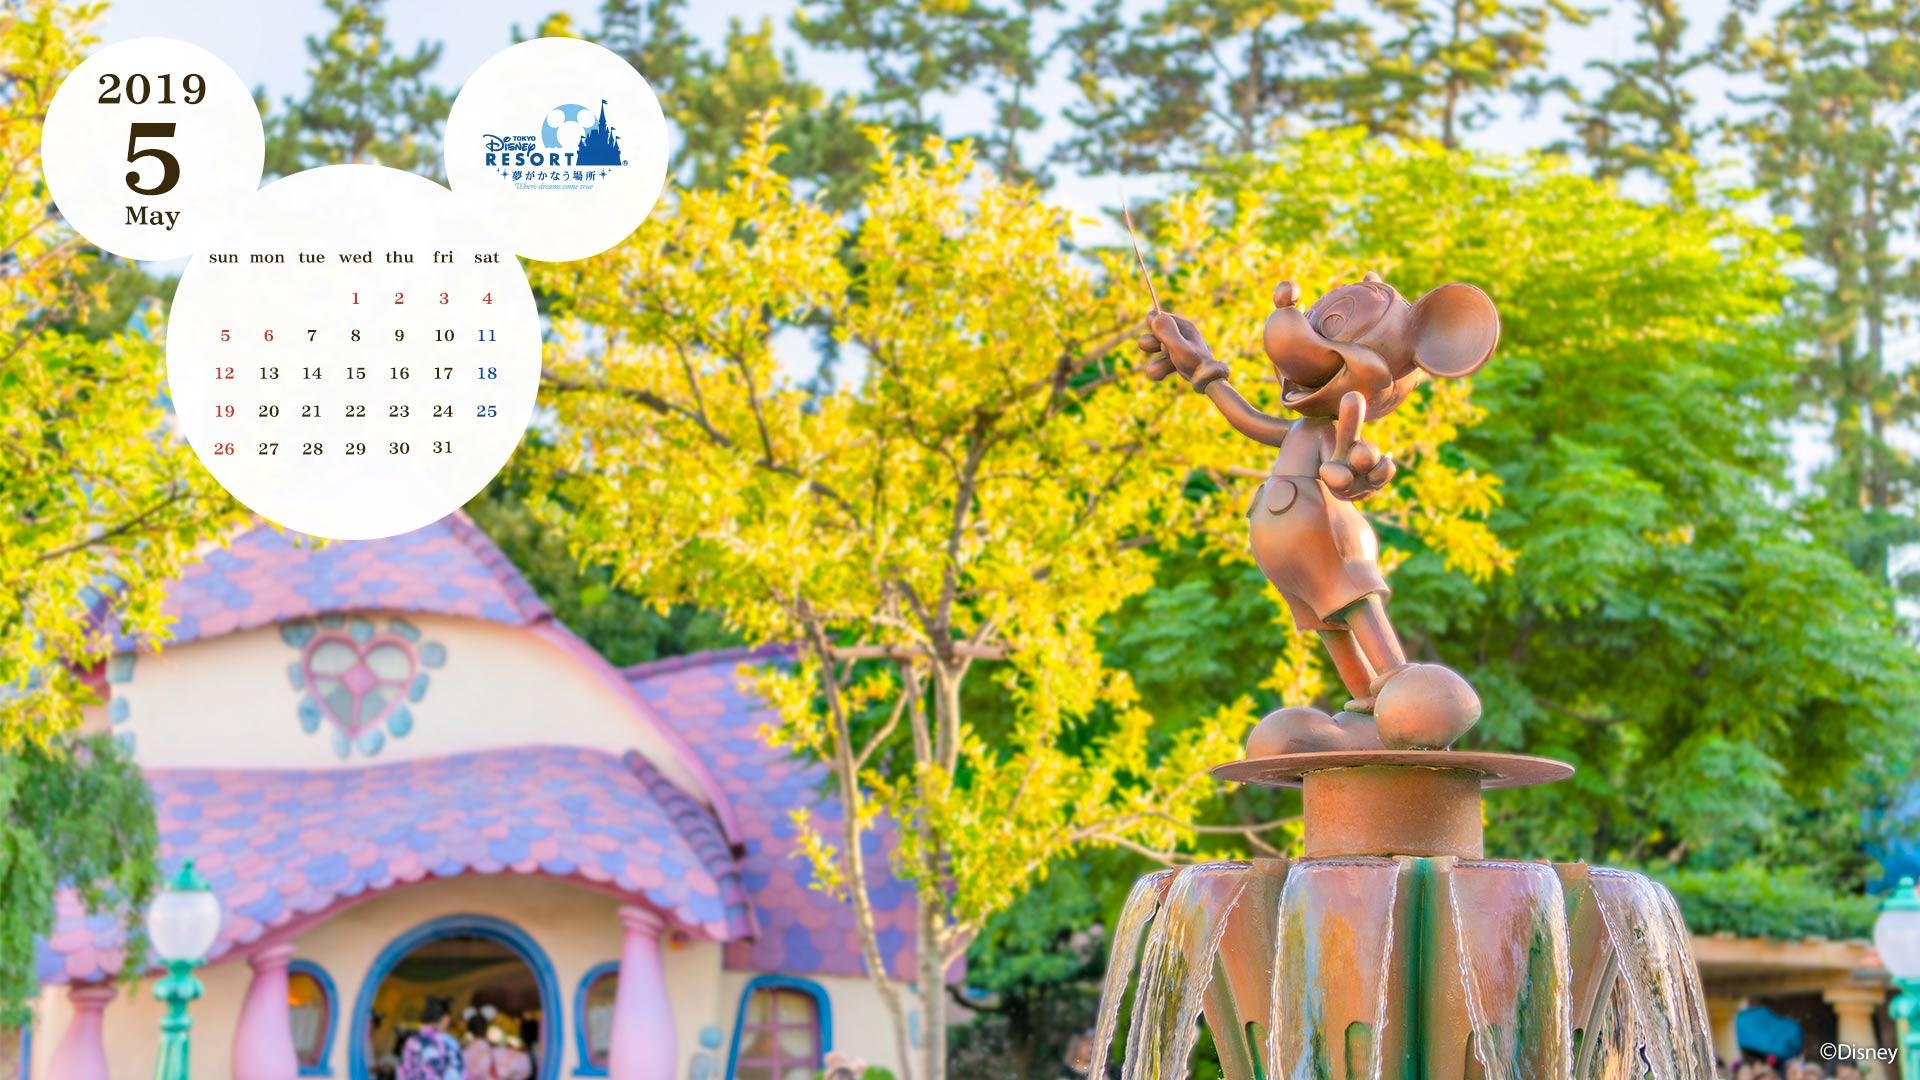 Official Pc Calendar Wallpaper Tokyo Disney Resort